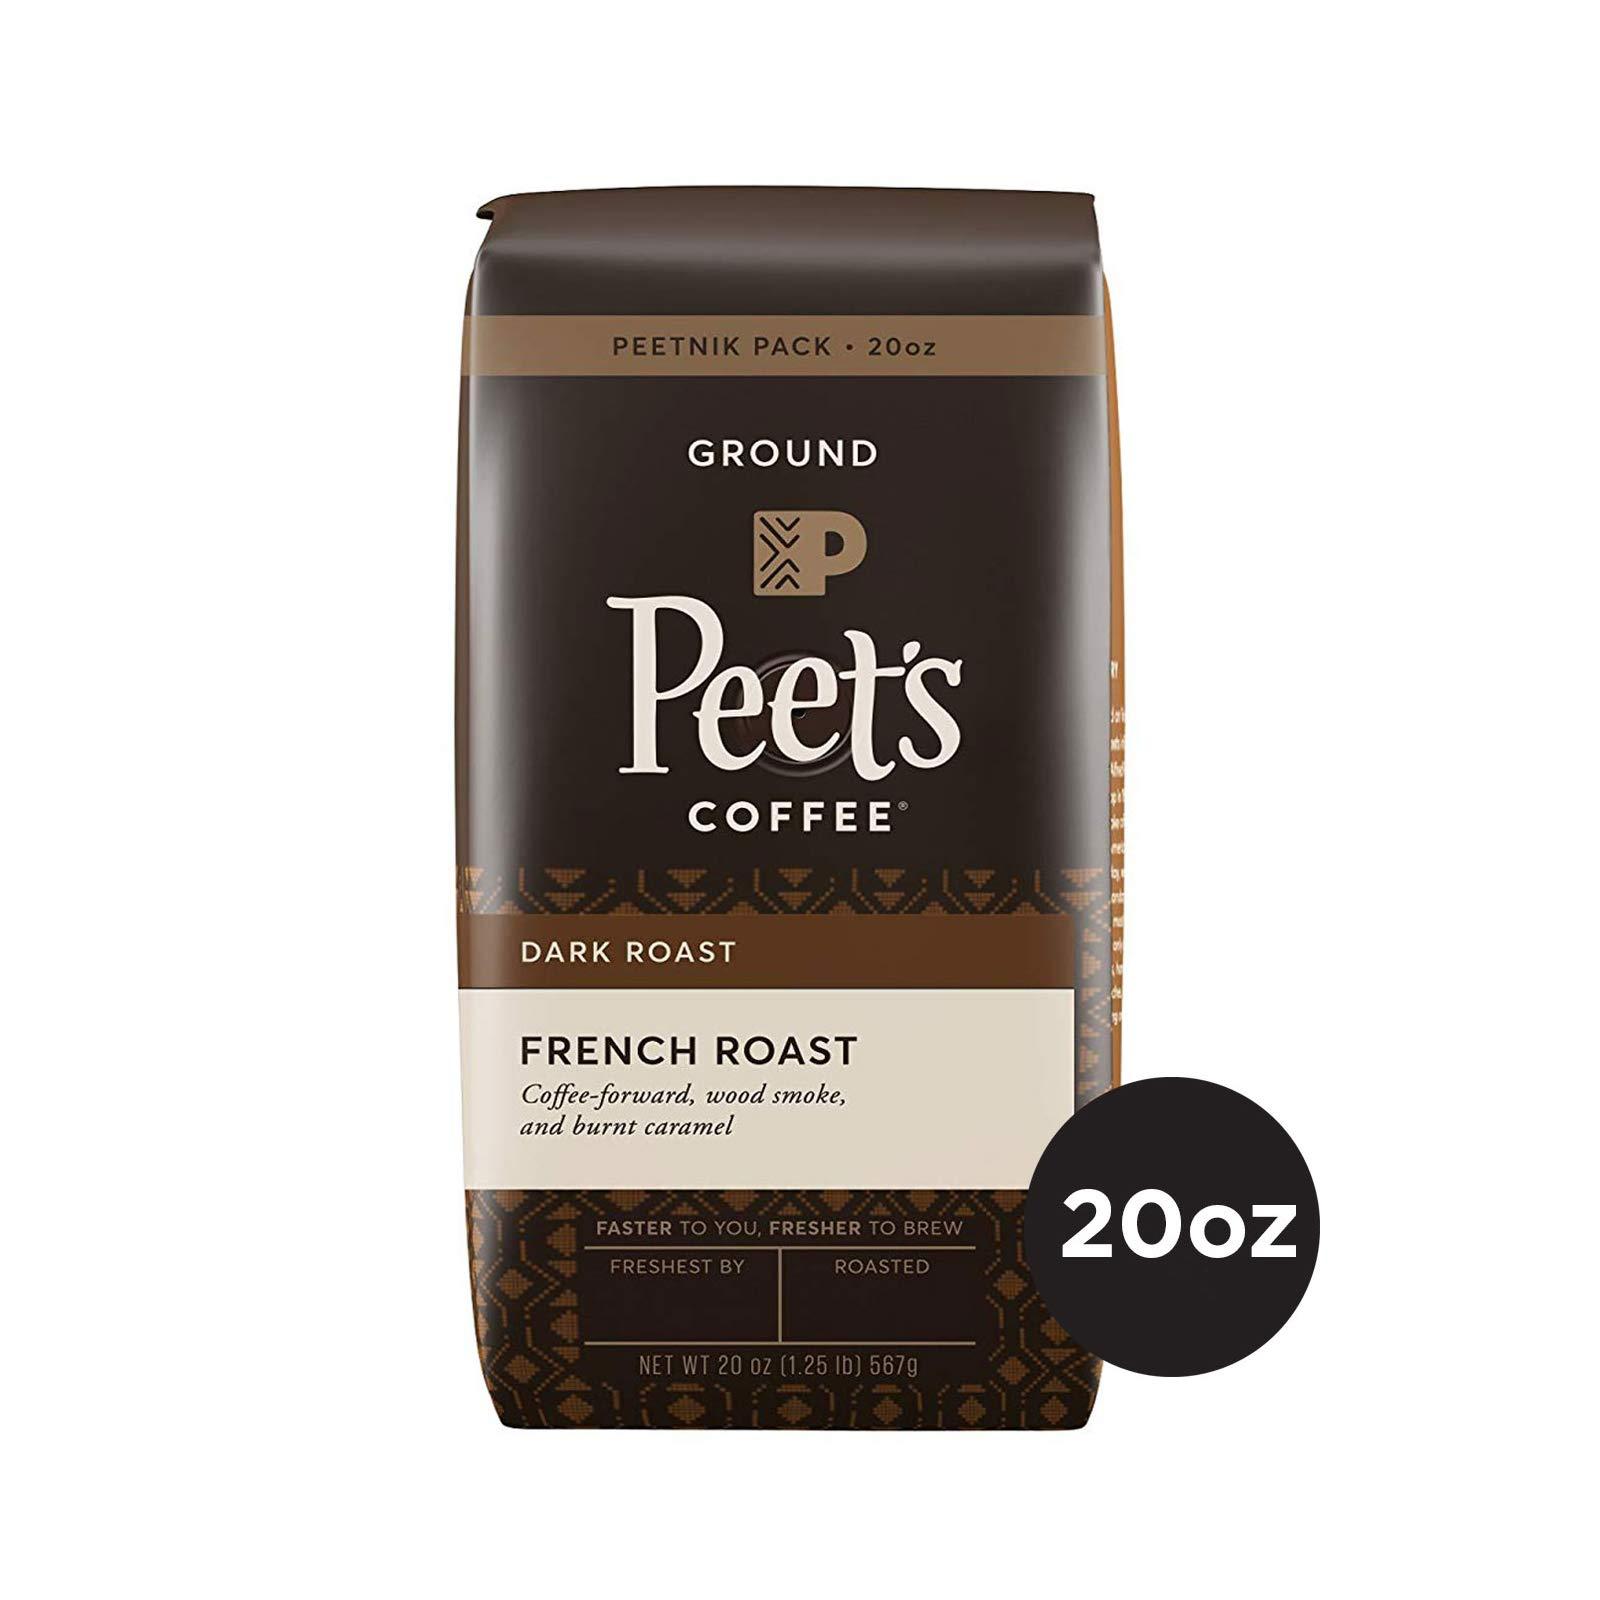 Peet's Coffee French Roast Dark Roast Ground Coffee, 20 Ounce Peetnik Value Pack